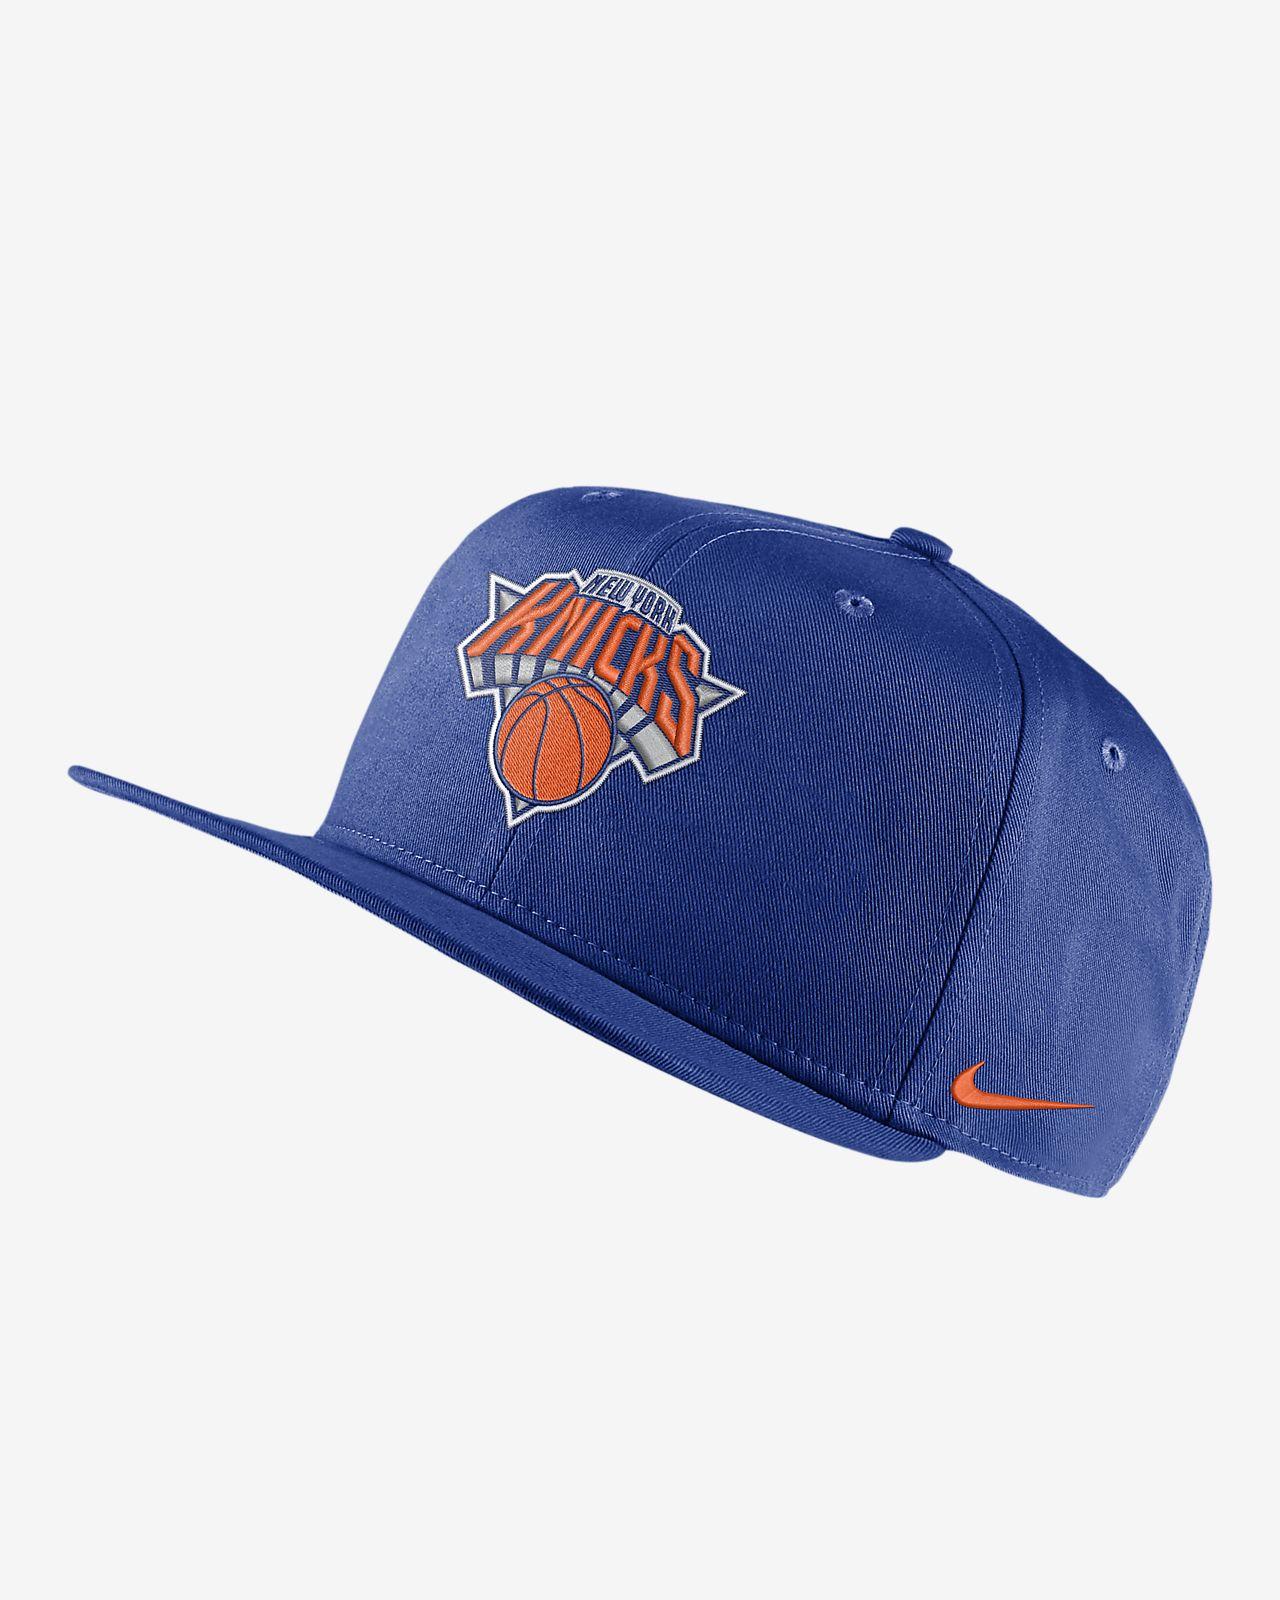 Бейсболка НБА New York Knicks Nike Pro